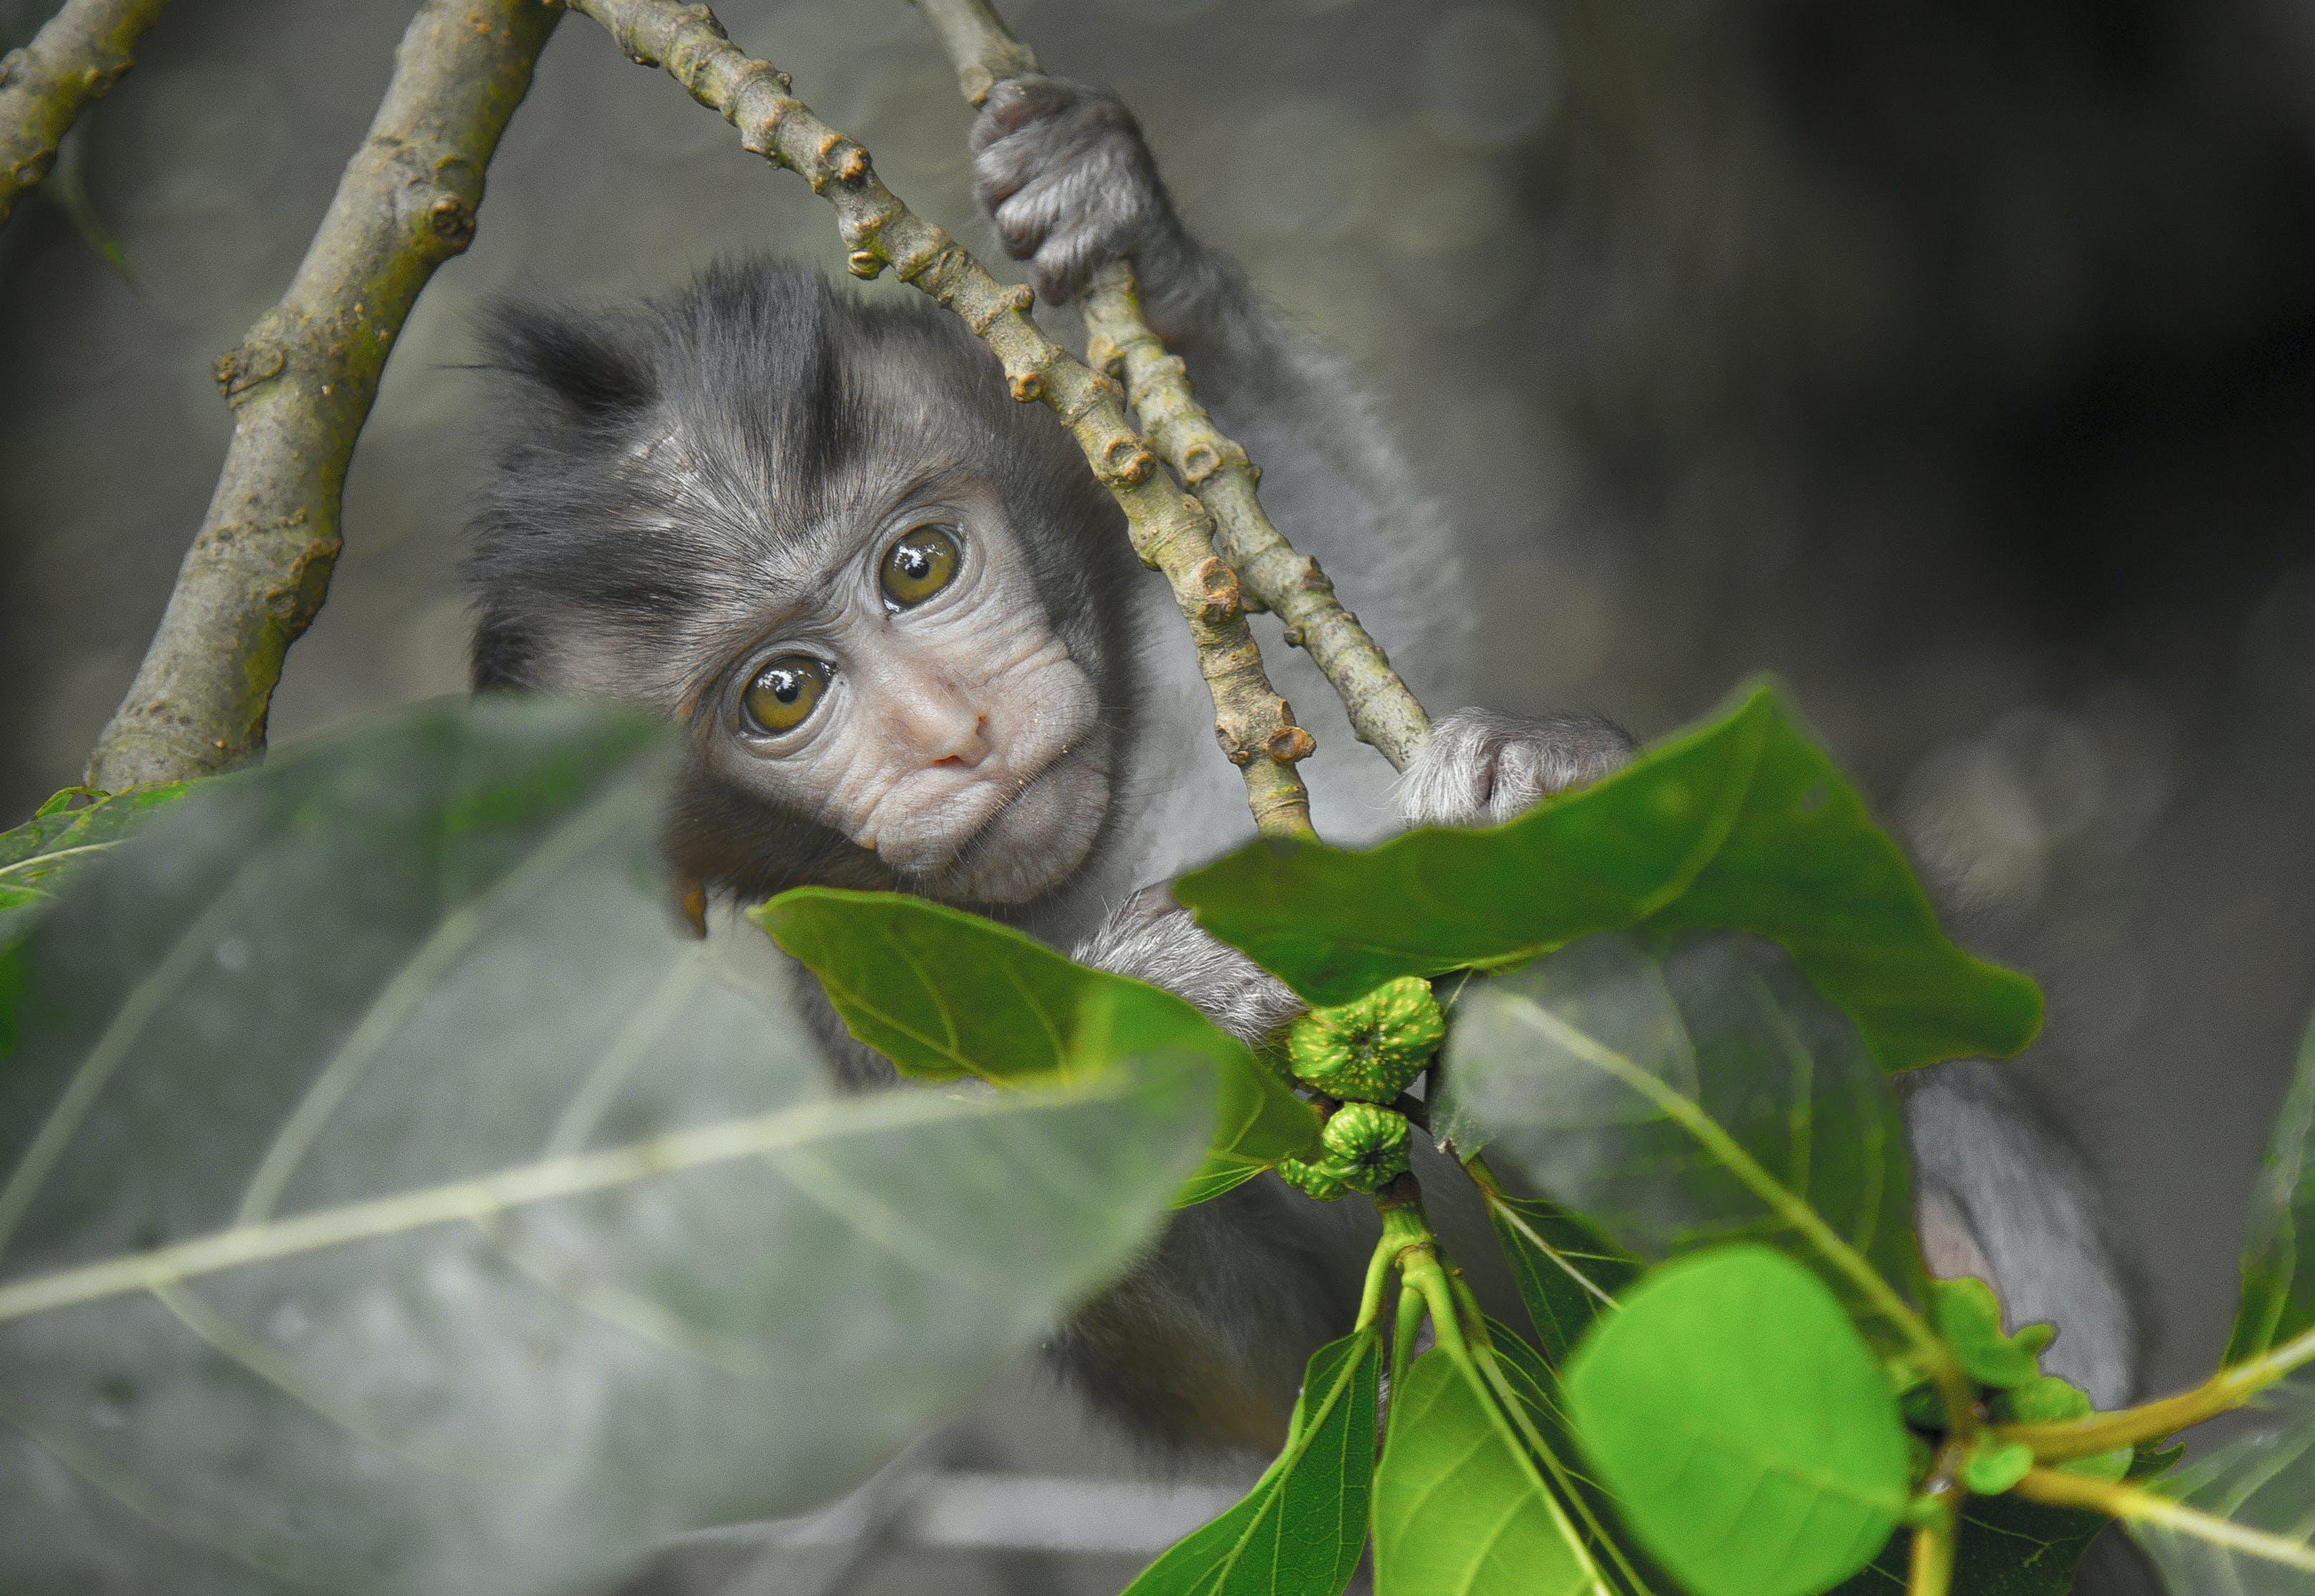 Gray Monkey Holding on Gray Tree Branch